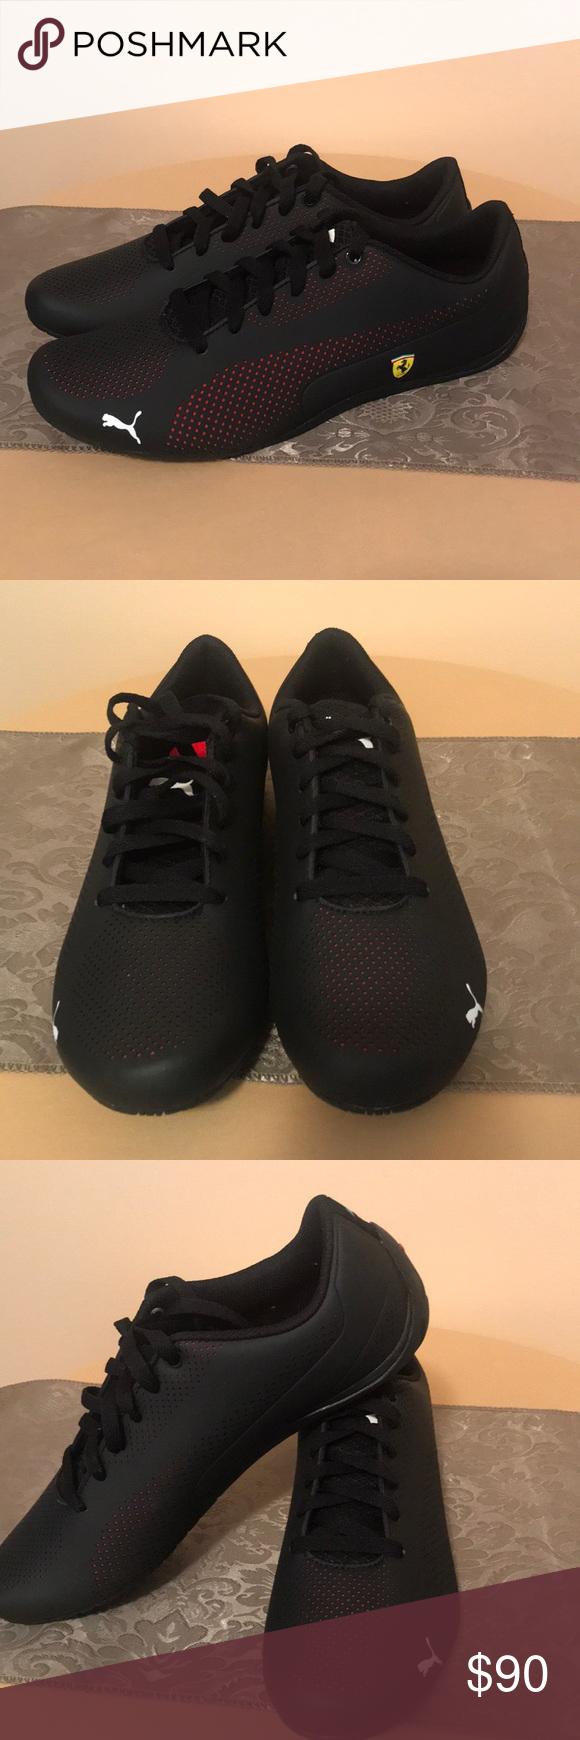 Running shoes for men, Shoe